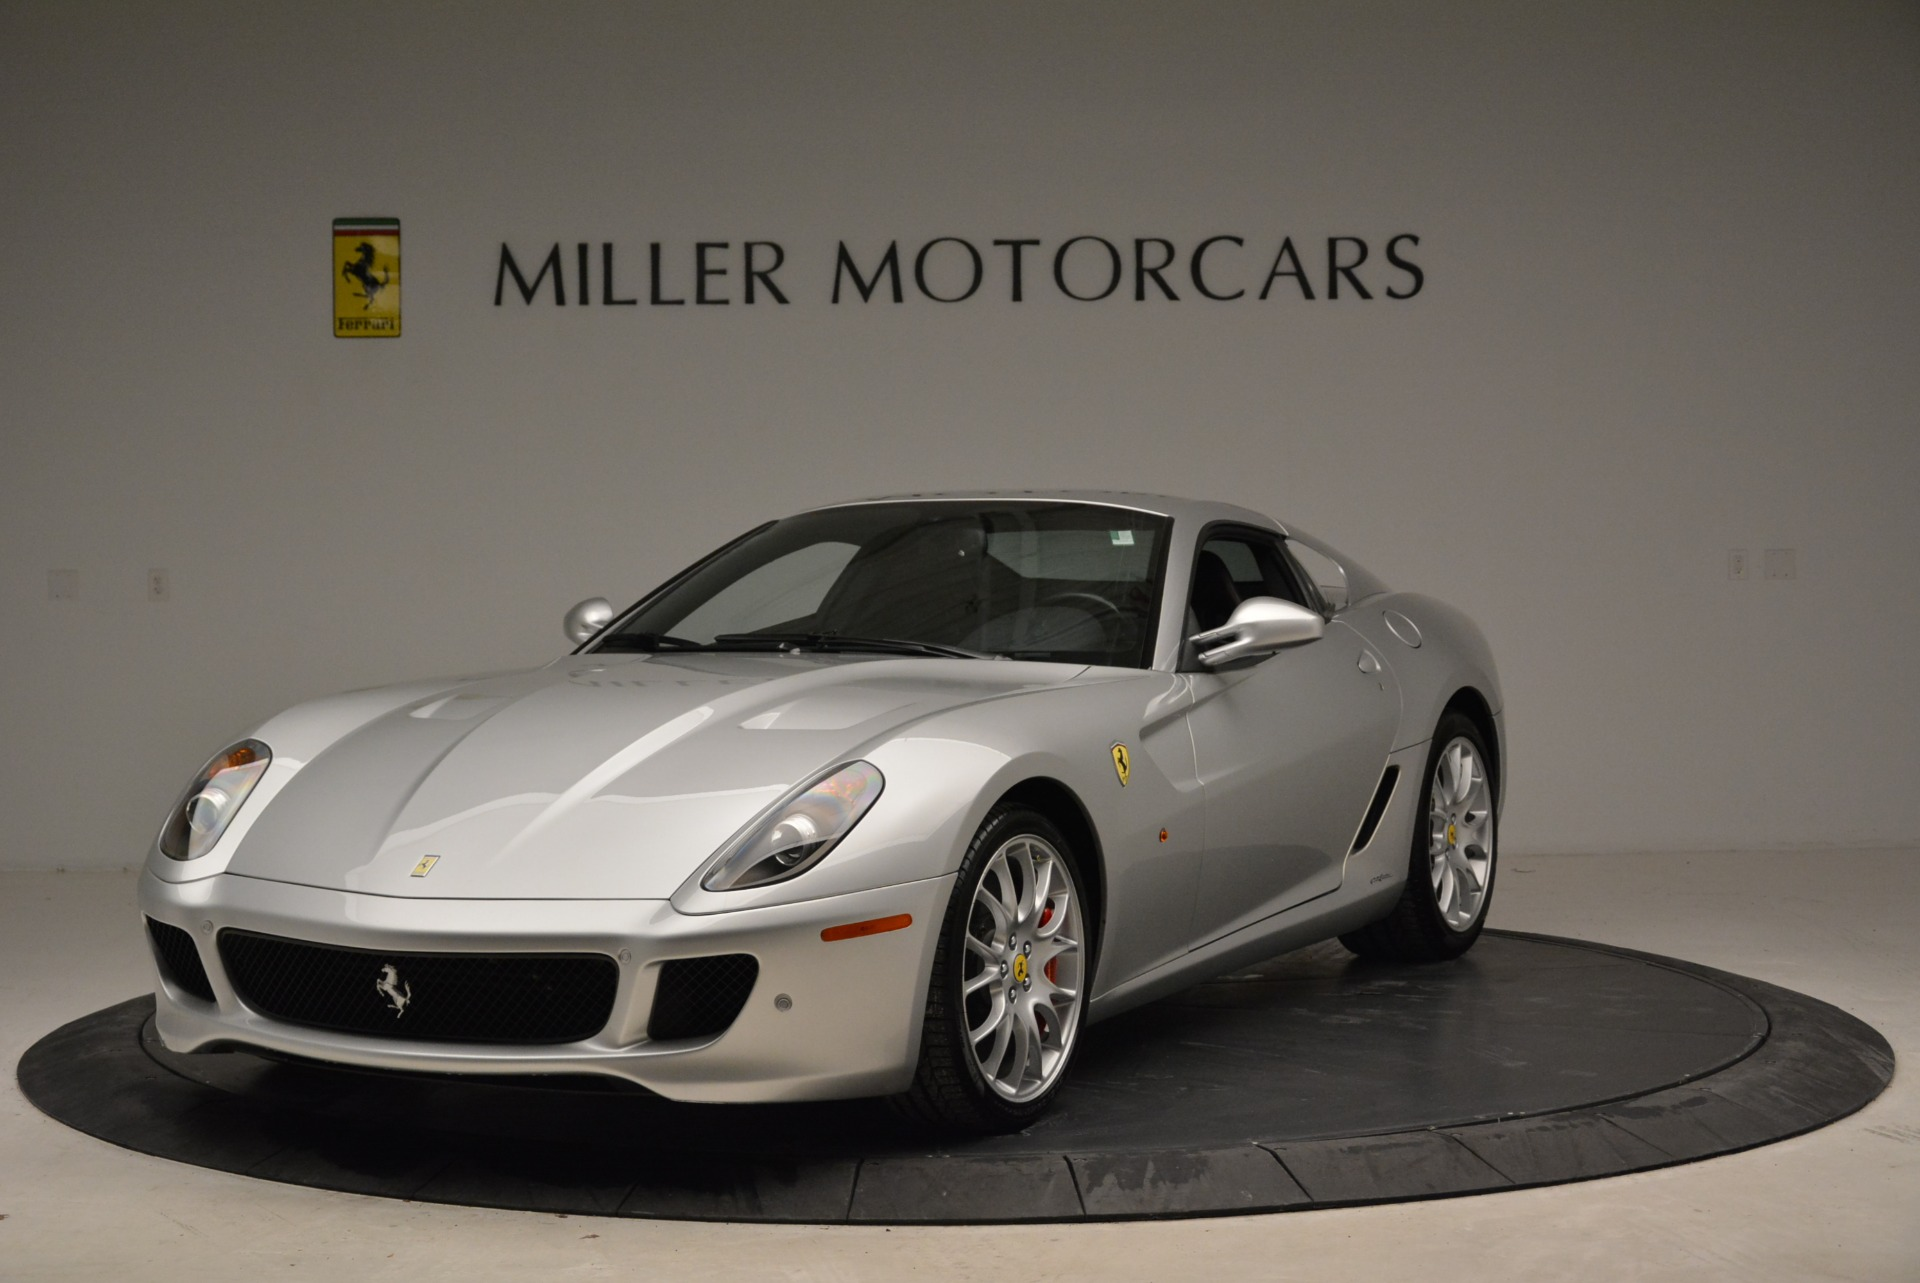 Used 2010 Ferrari 599 GTB Fiorano for sale Sold at Bentley Greenwich in Greenwich CT 06830 1